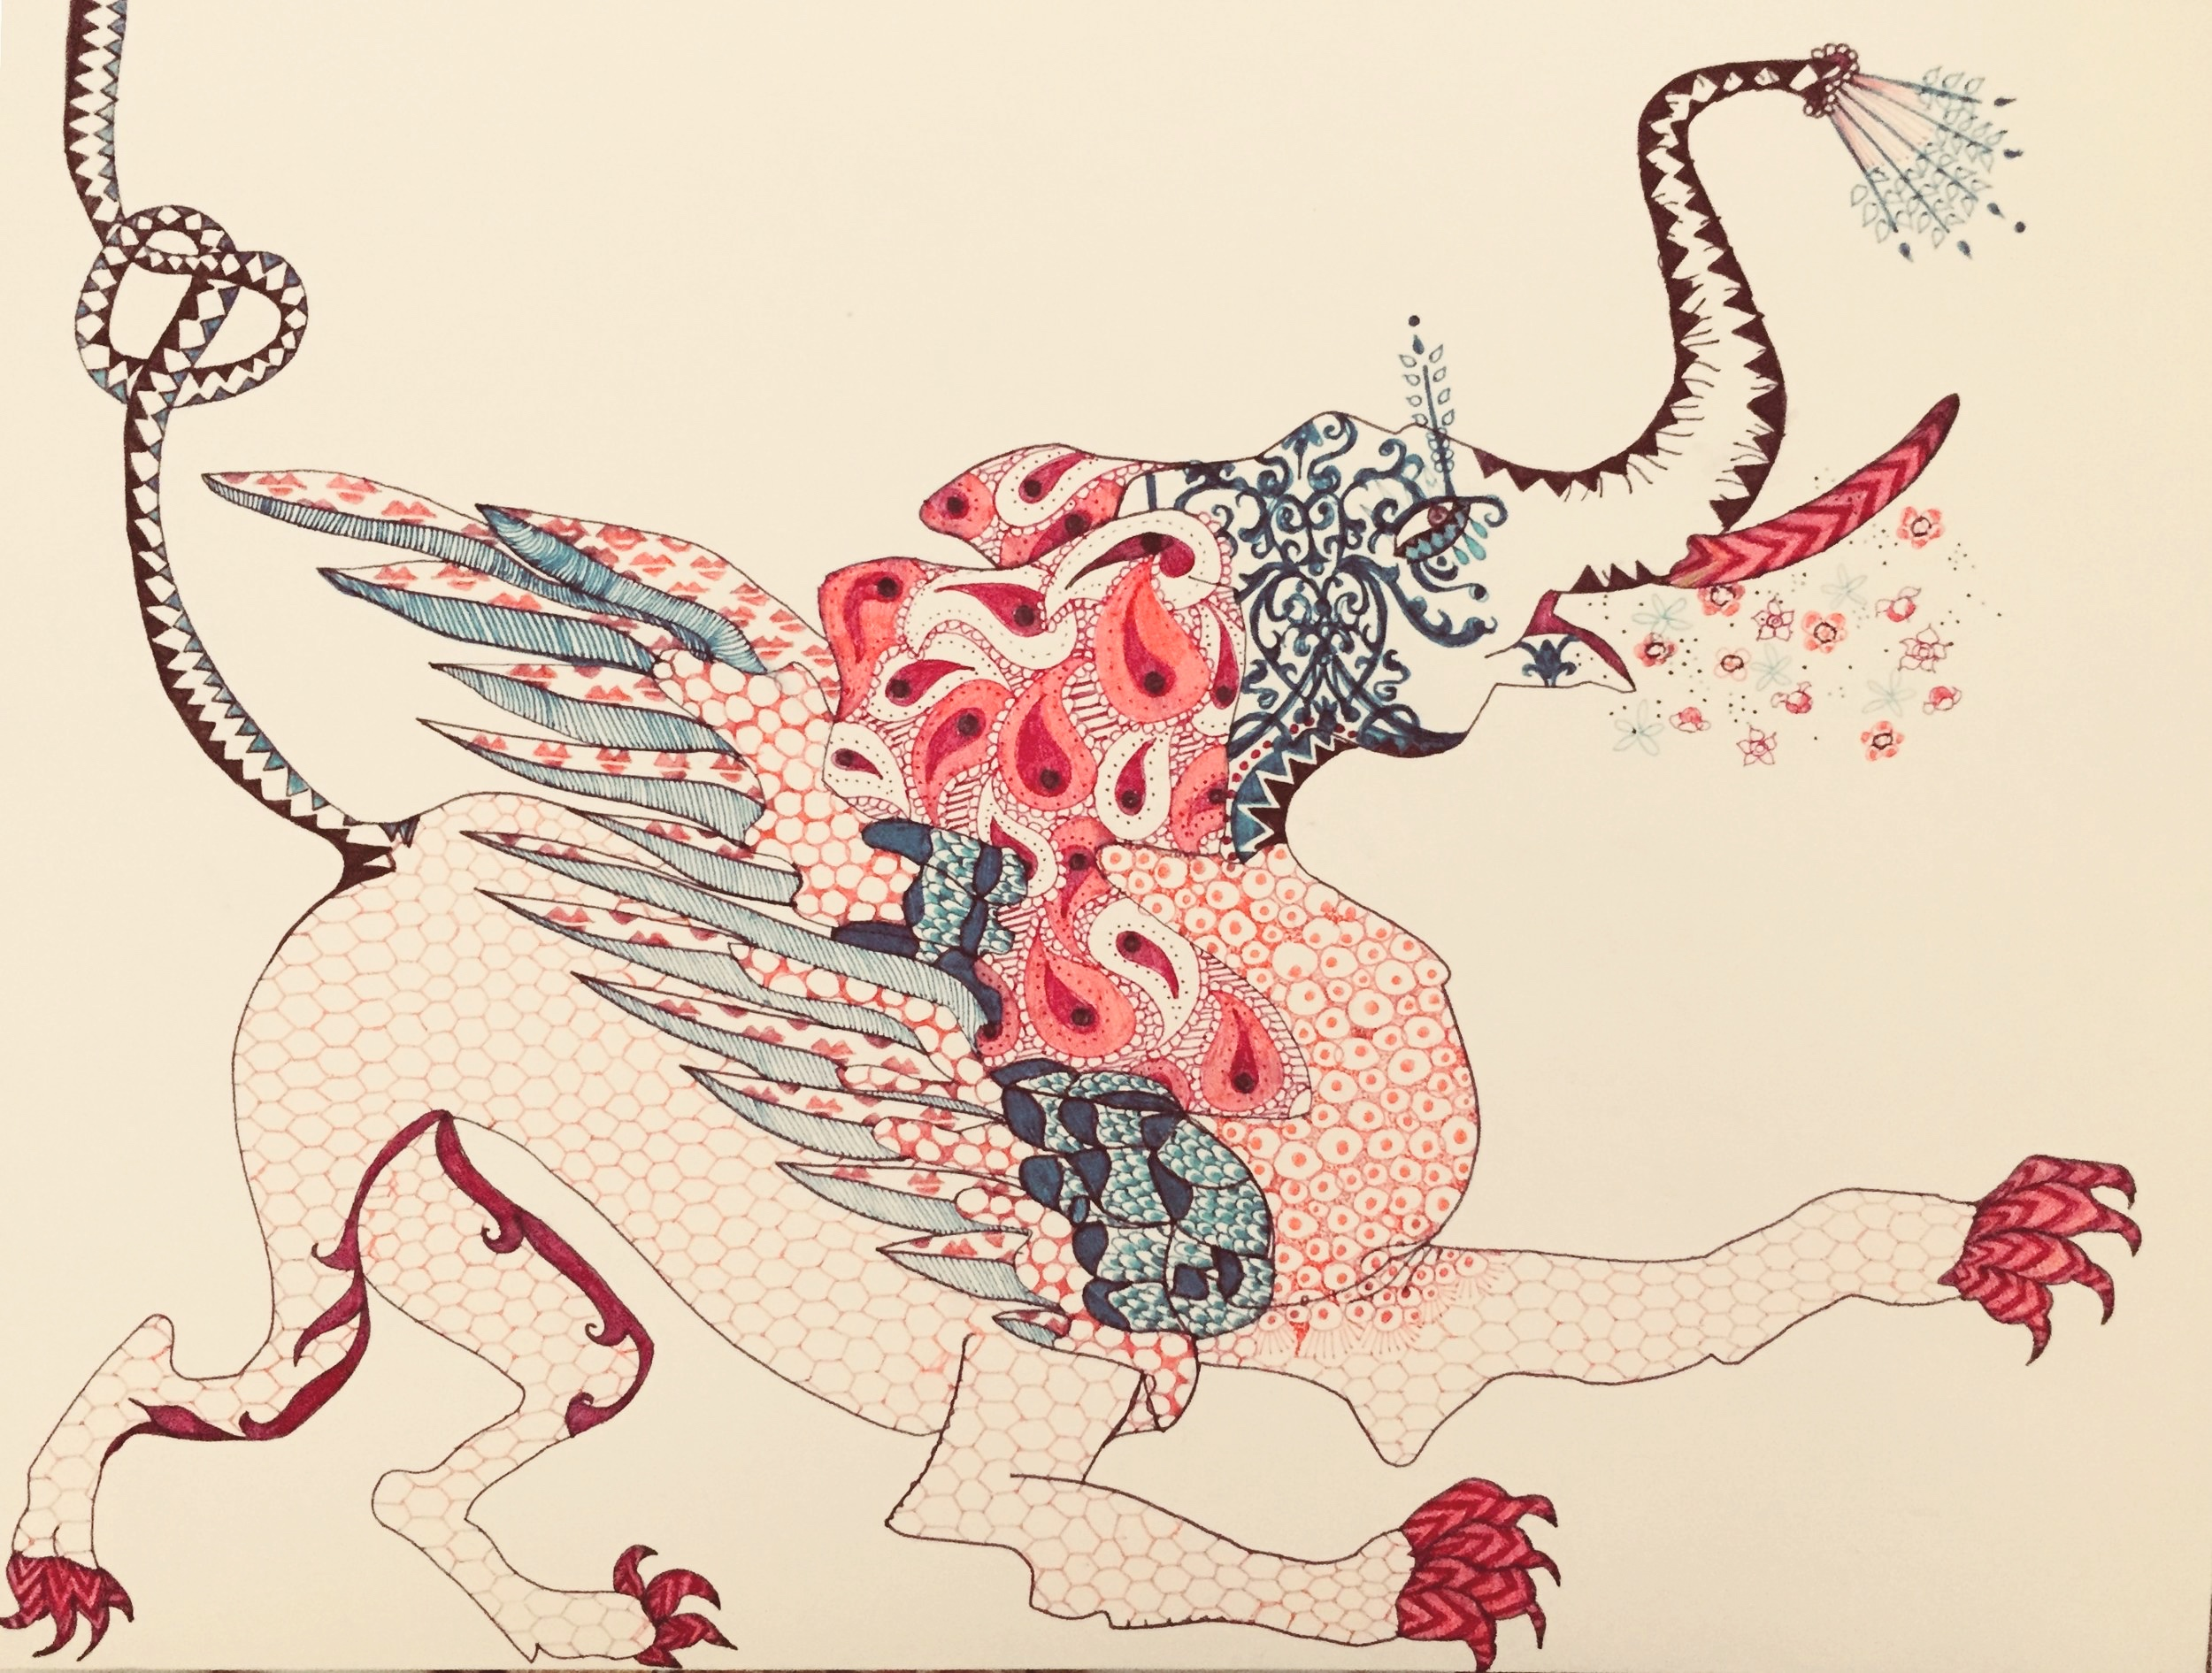 hybrid creature 1 (elephant gryphon)